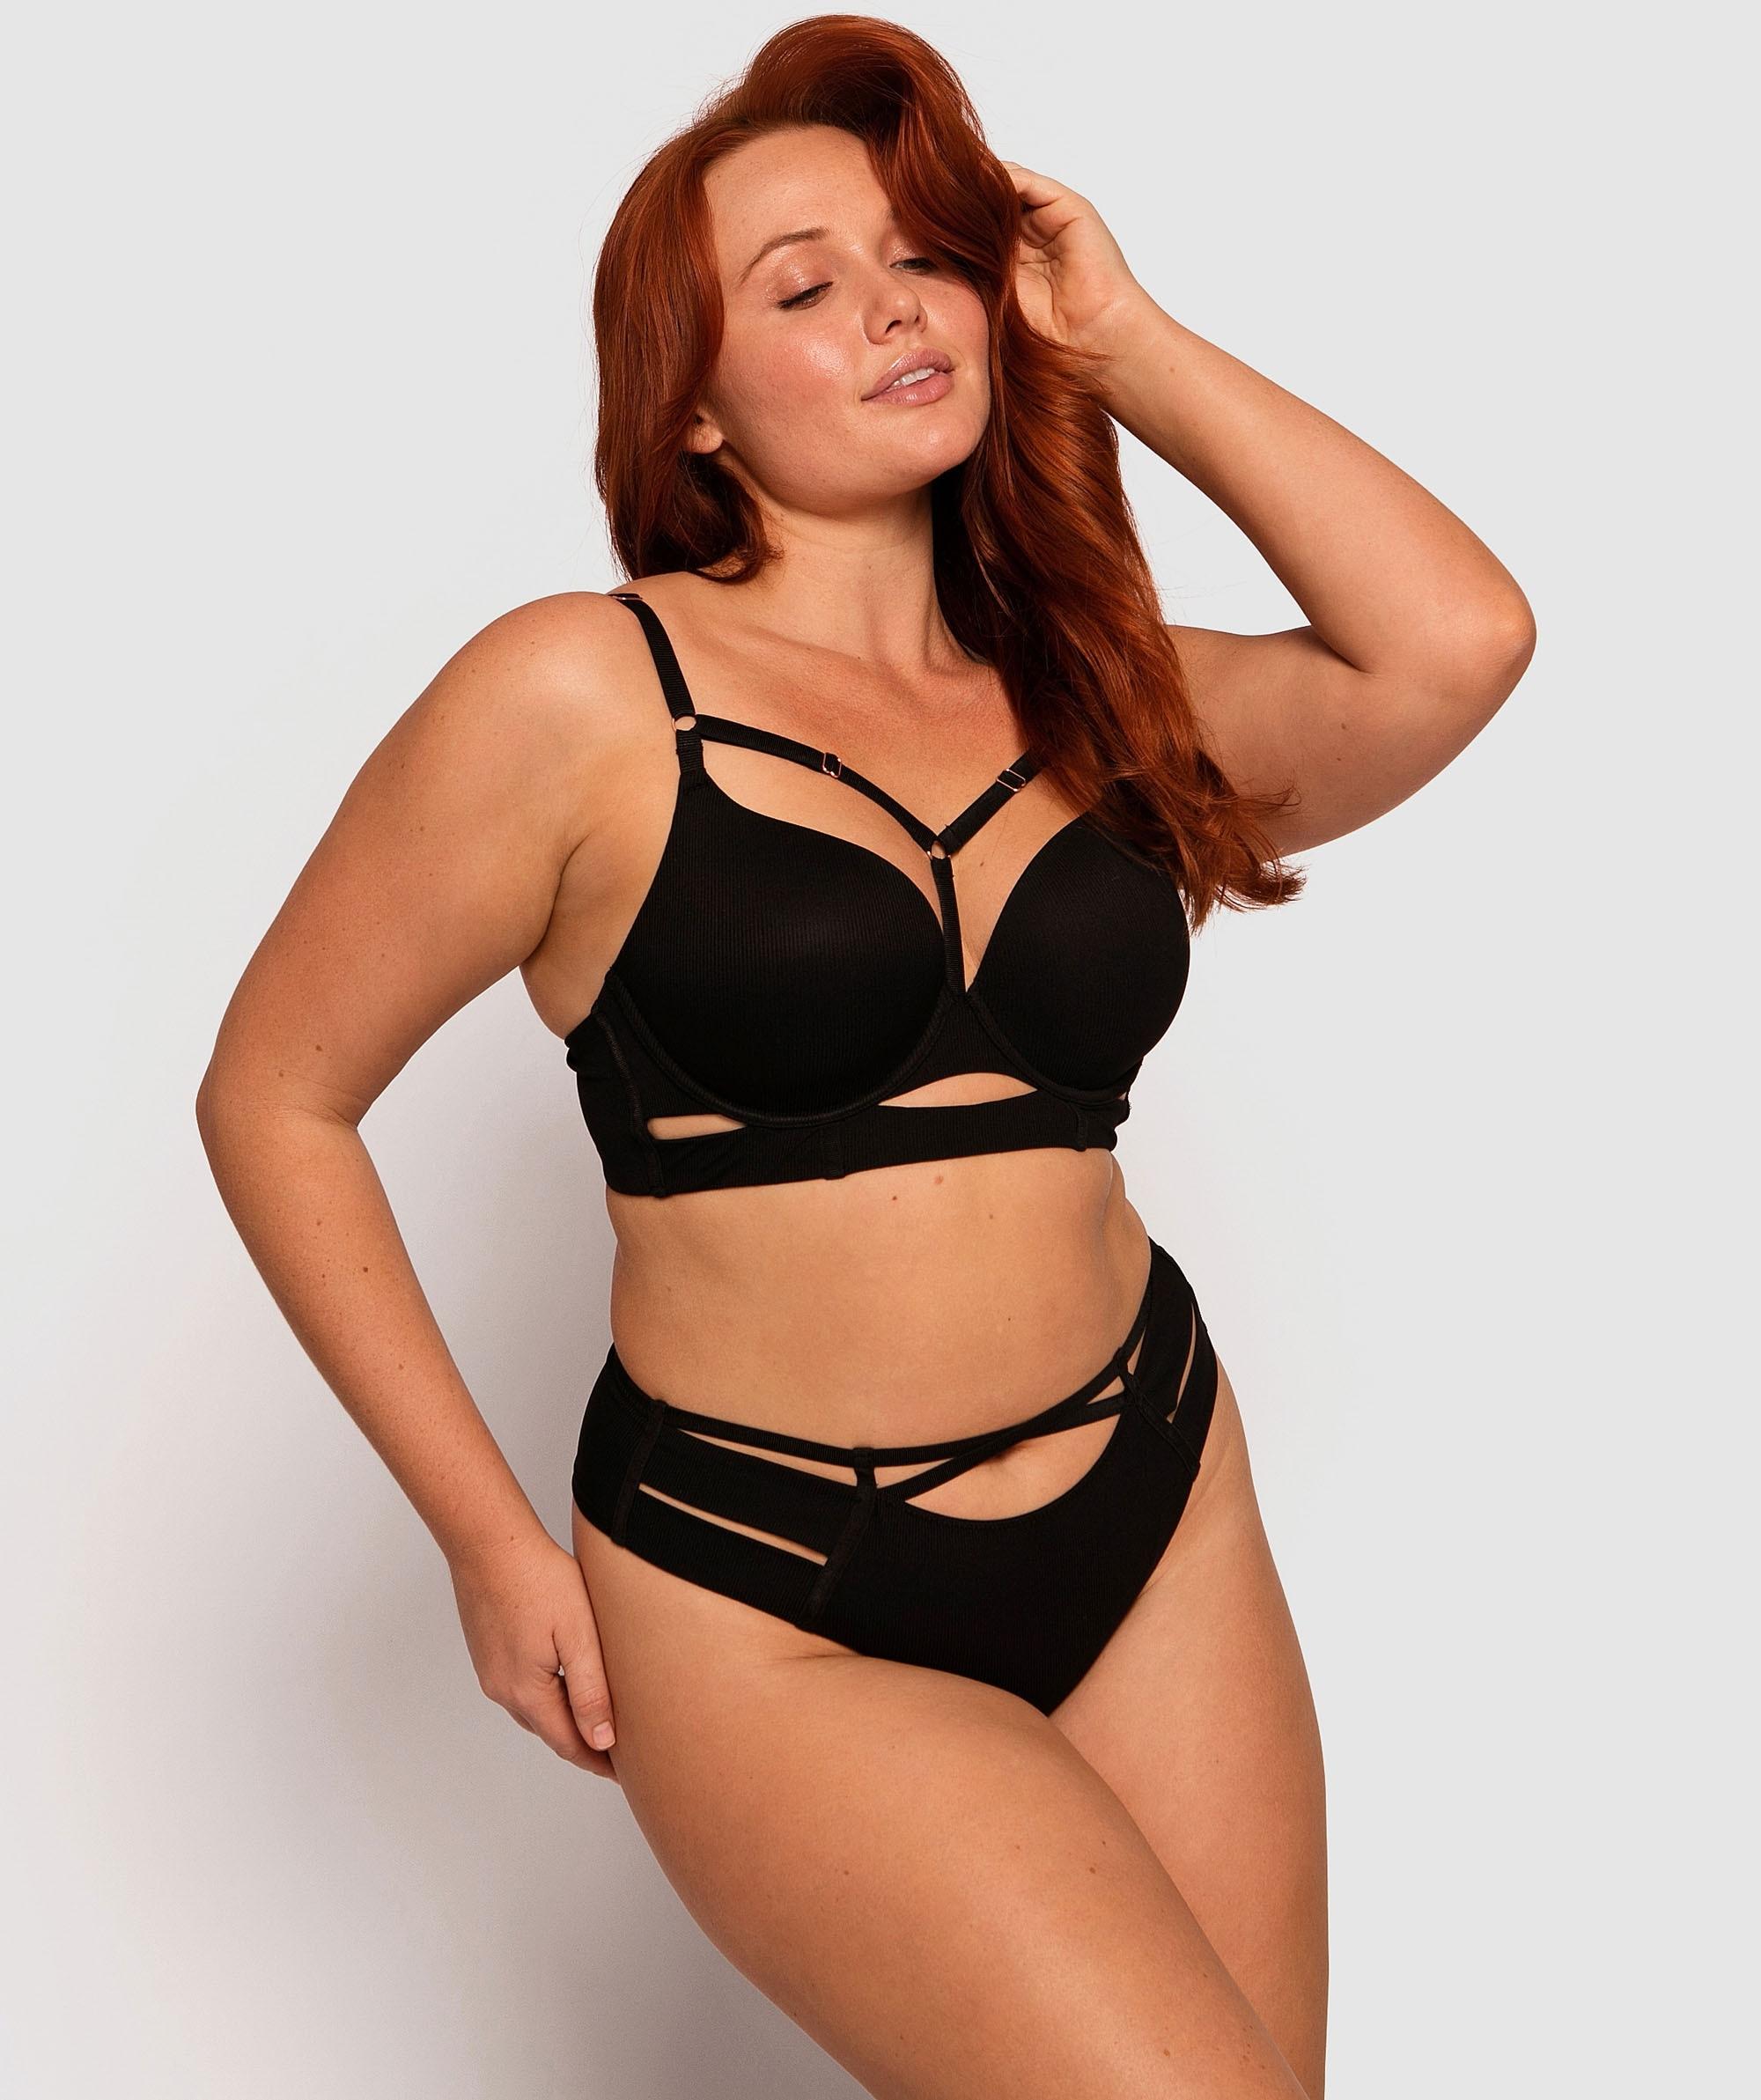 Erika High Waisted V String Knicker - Black